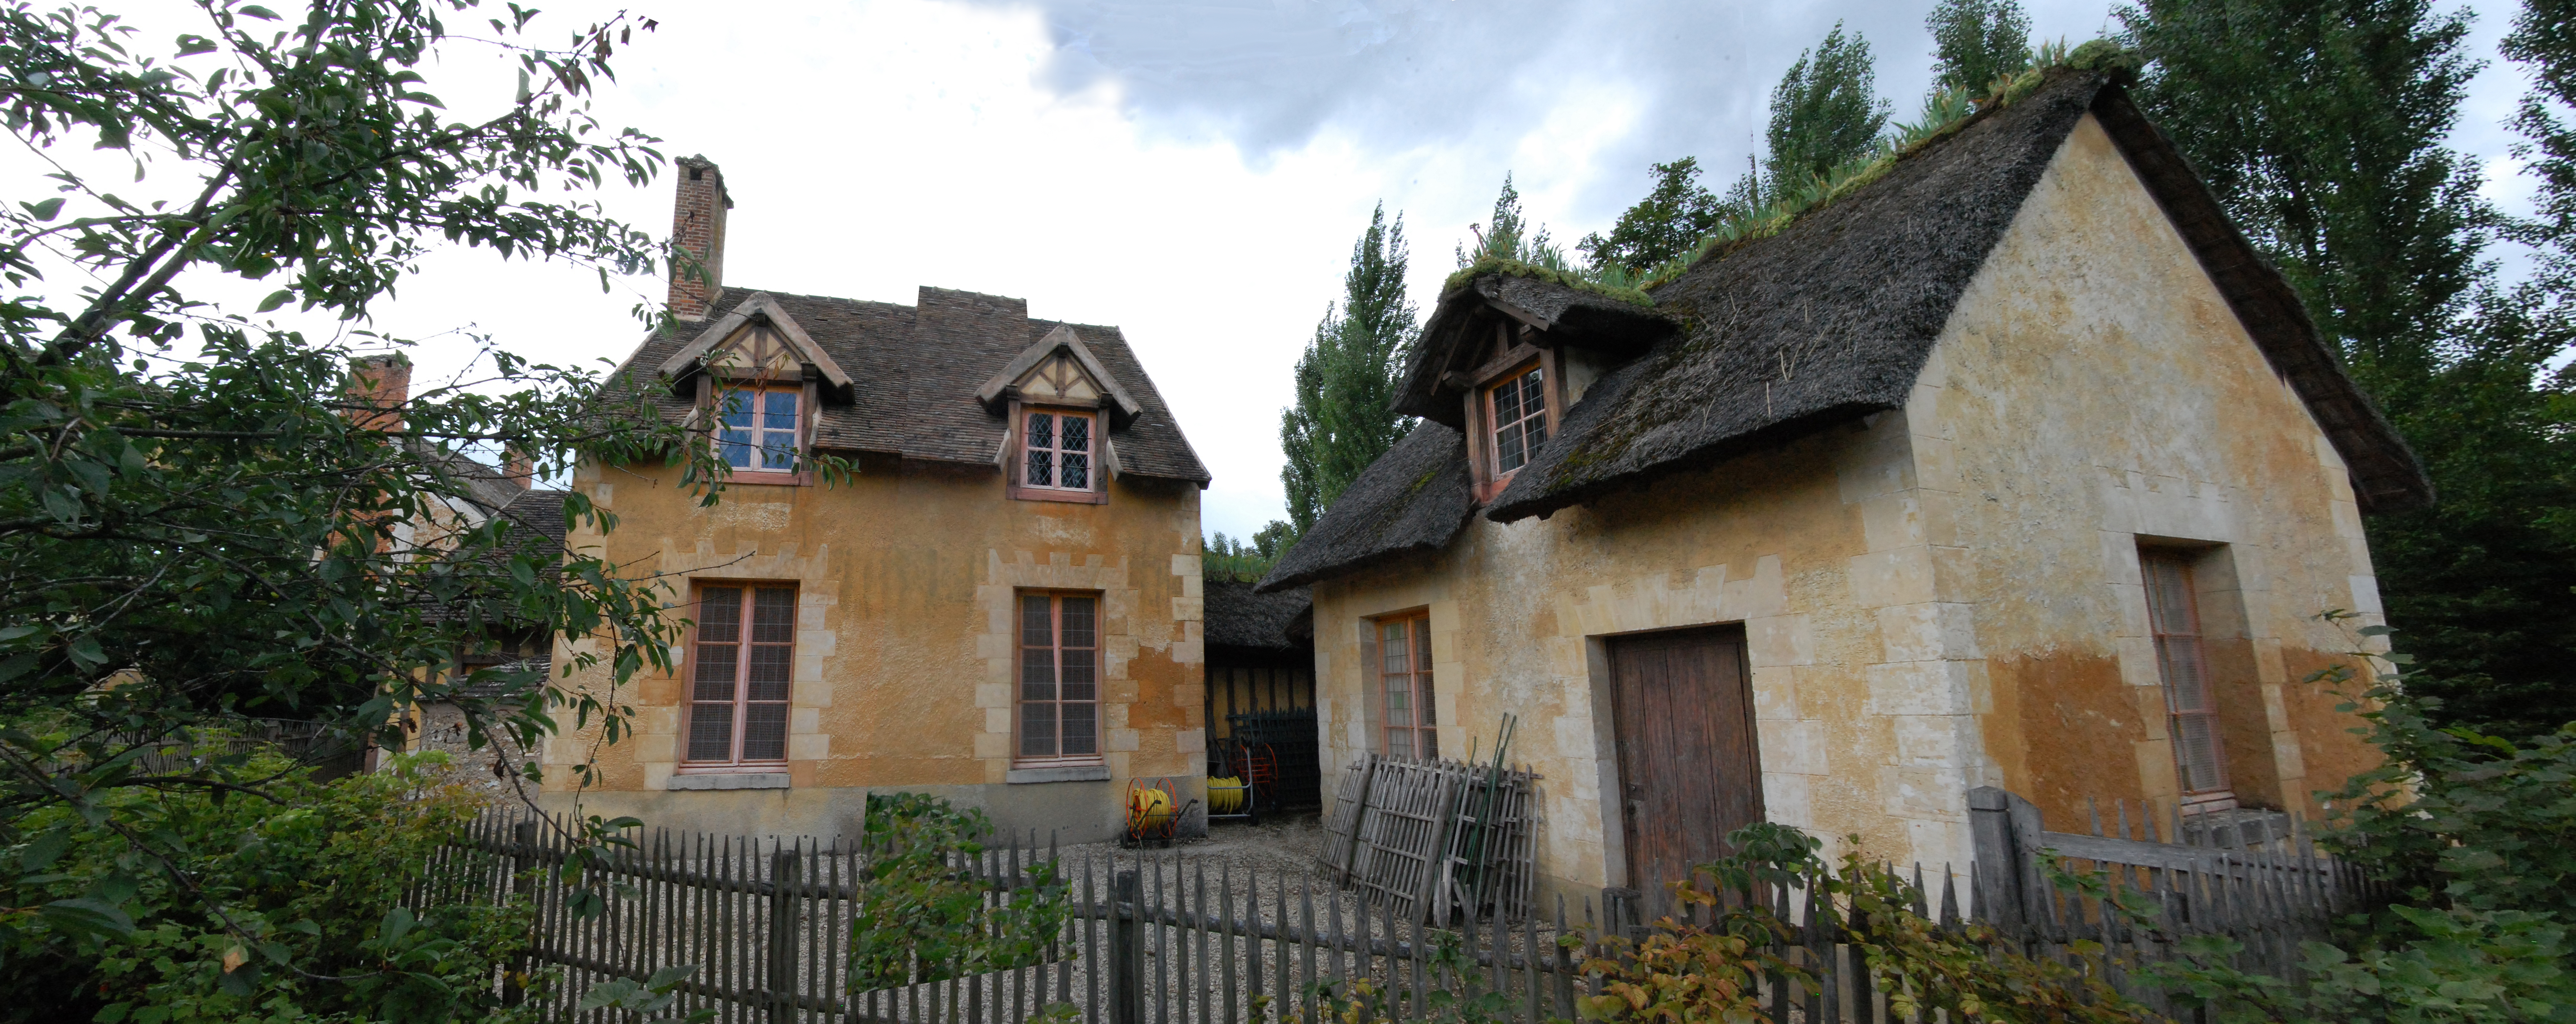 http://upload.wikimedia.org/wikipedia/commons/b/b4/Panoramique_-_R%C3%A9chauffoir_du_hameau_de_la_Reine.jpg